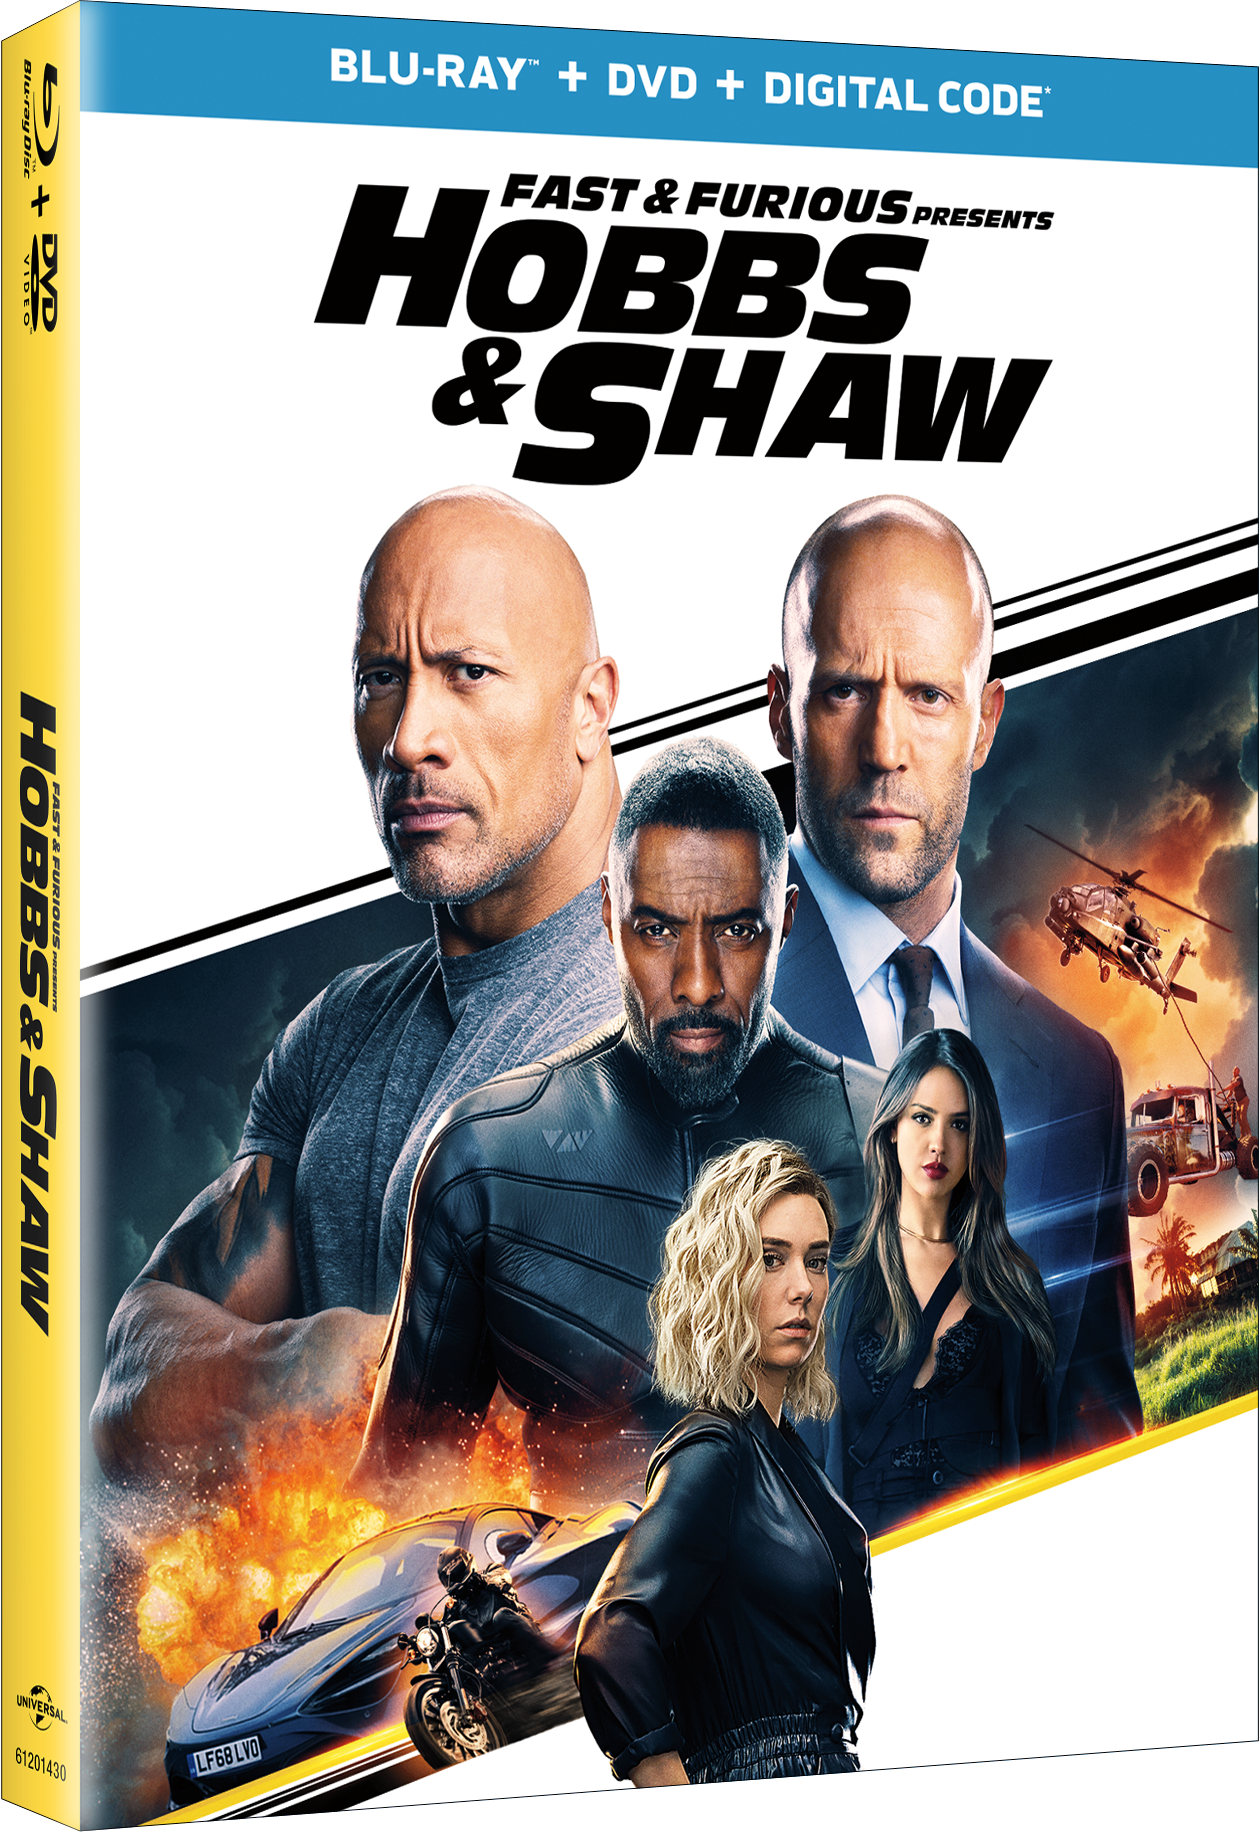 Buy Hobbs & Shaw on Blu-ray.